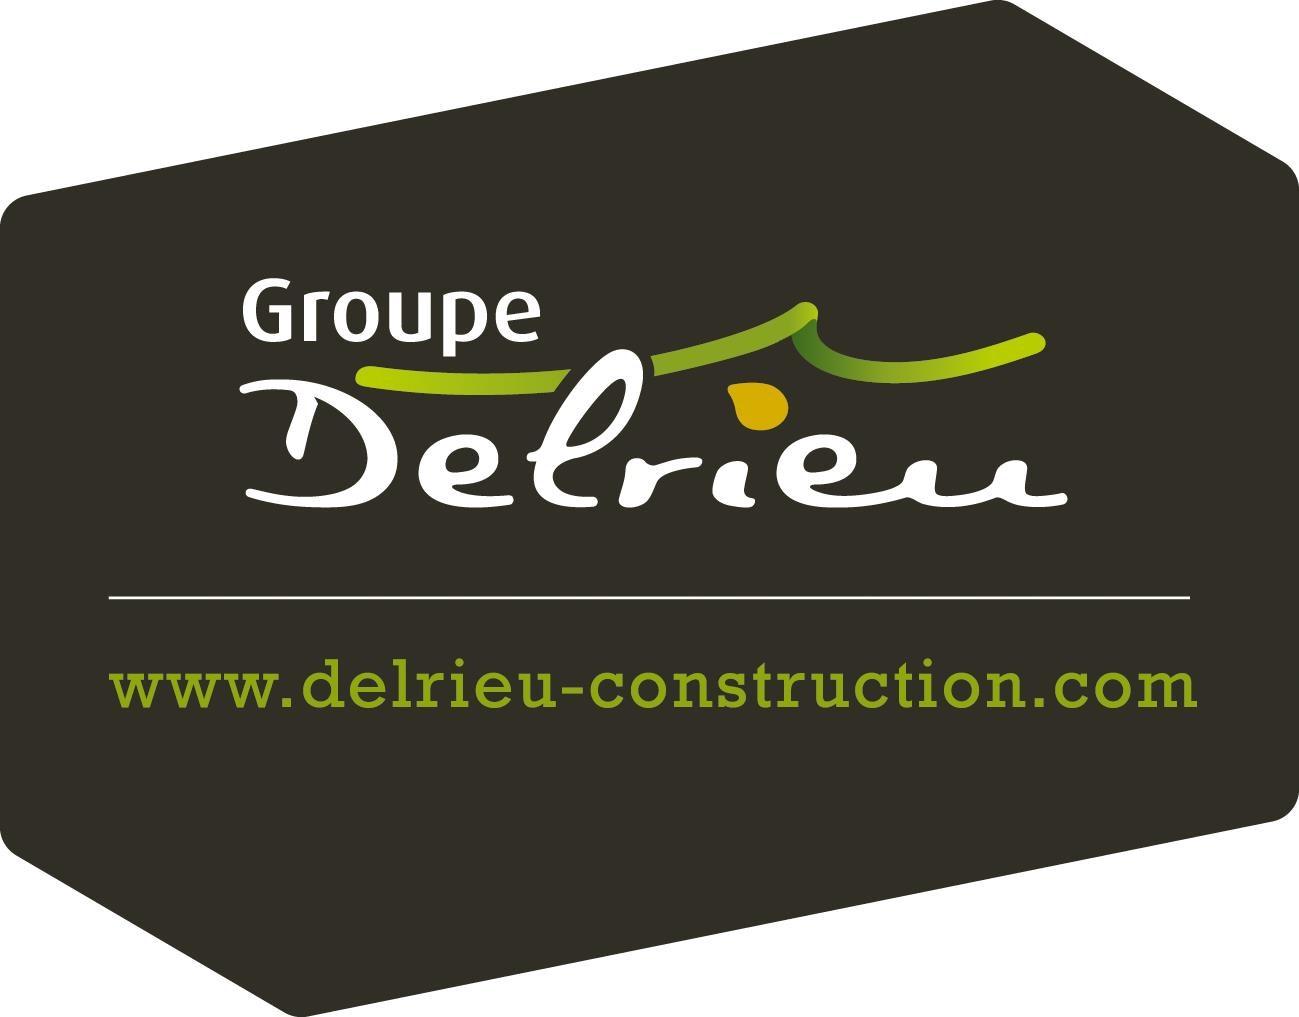 DELRIEU CONSTRUCTION